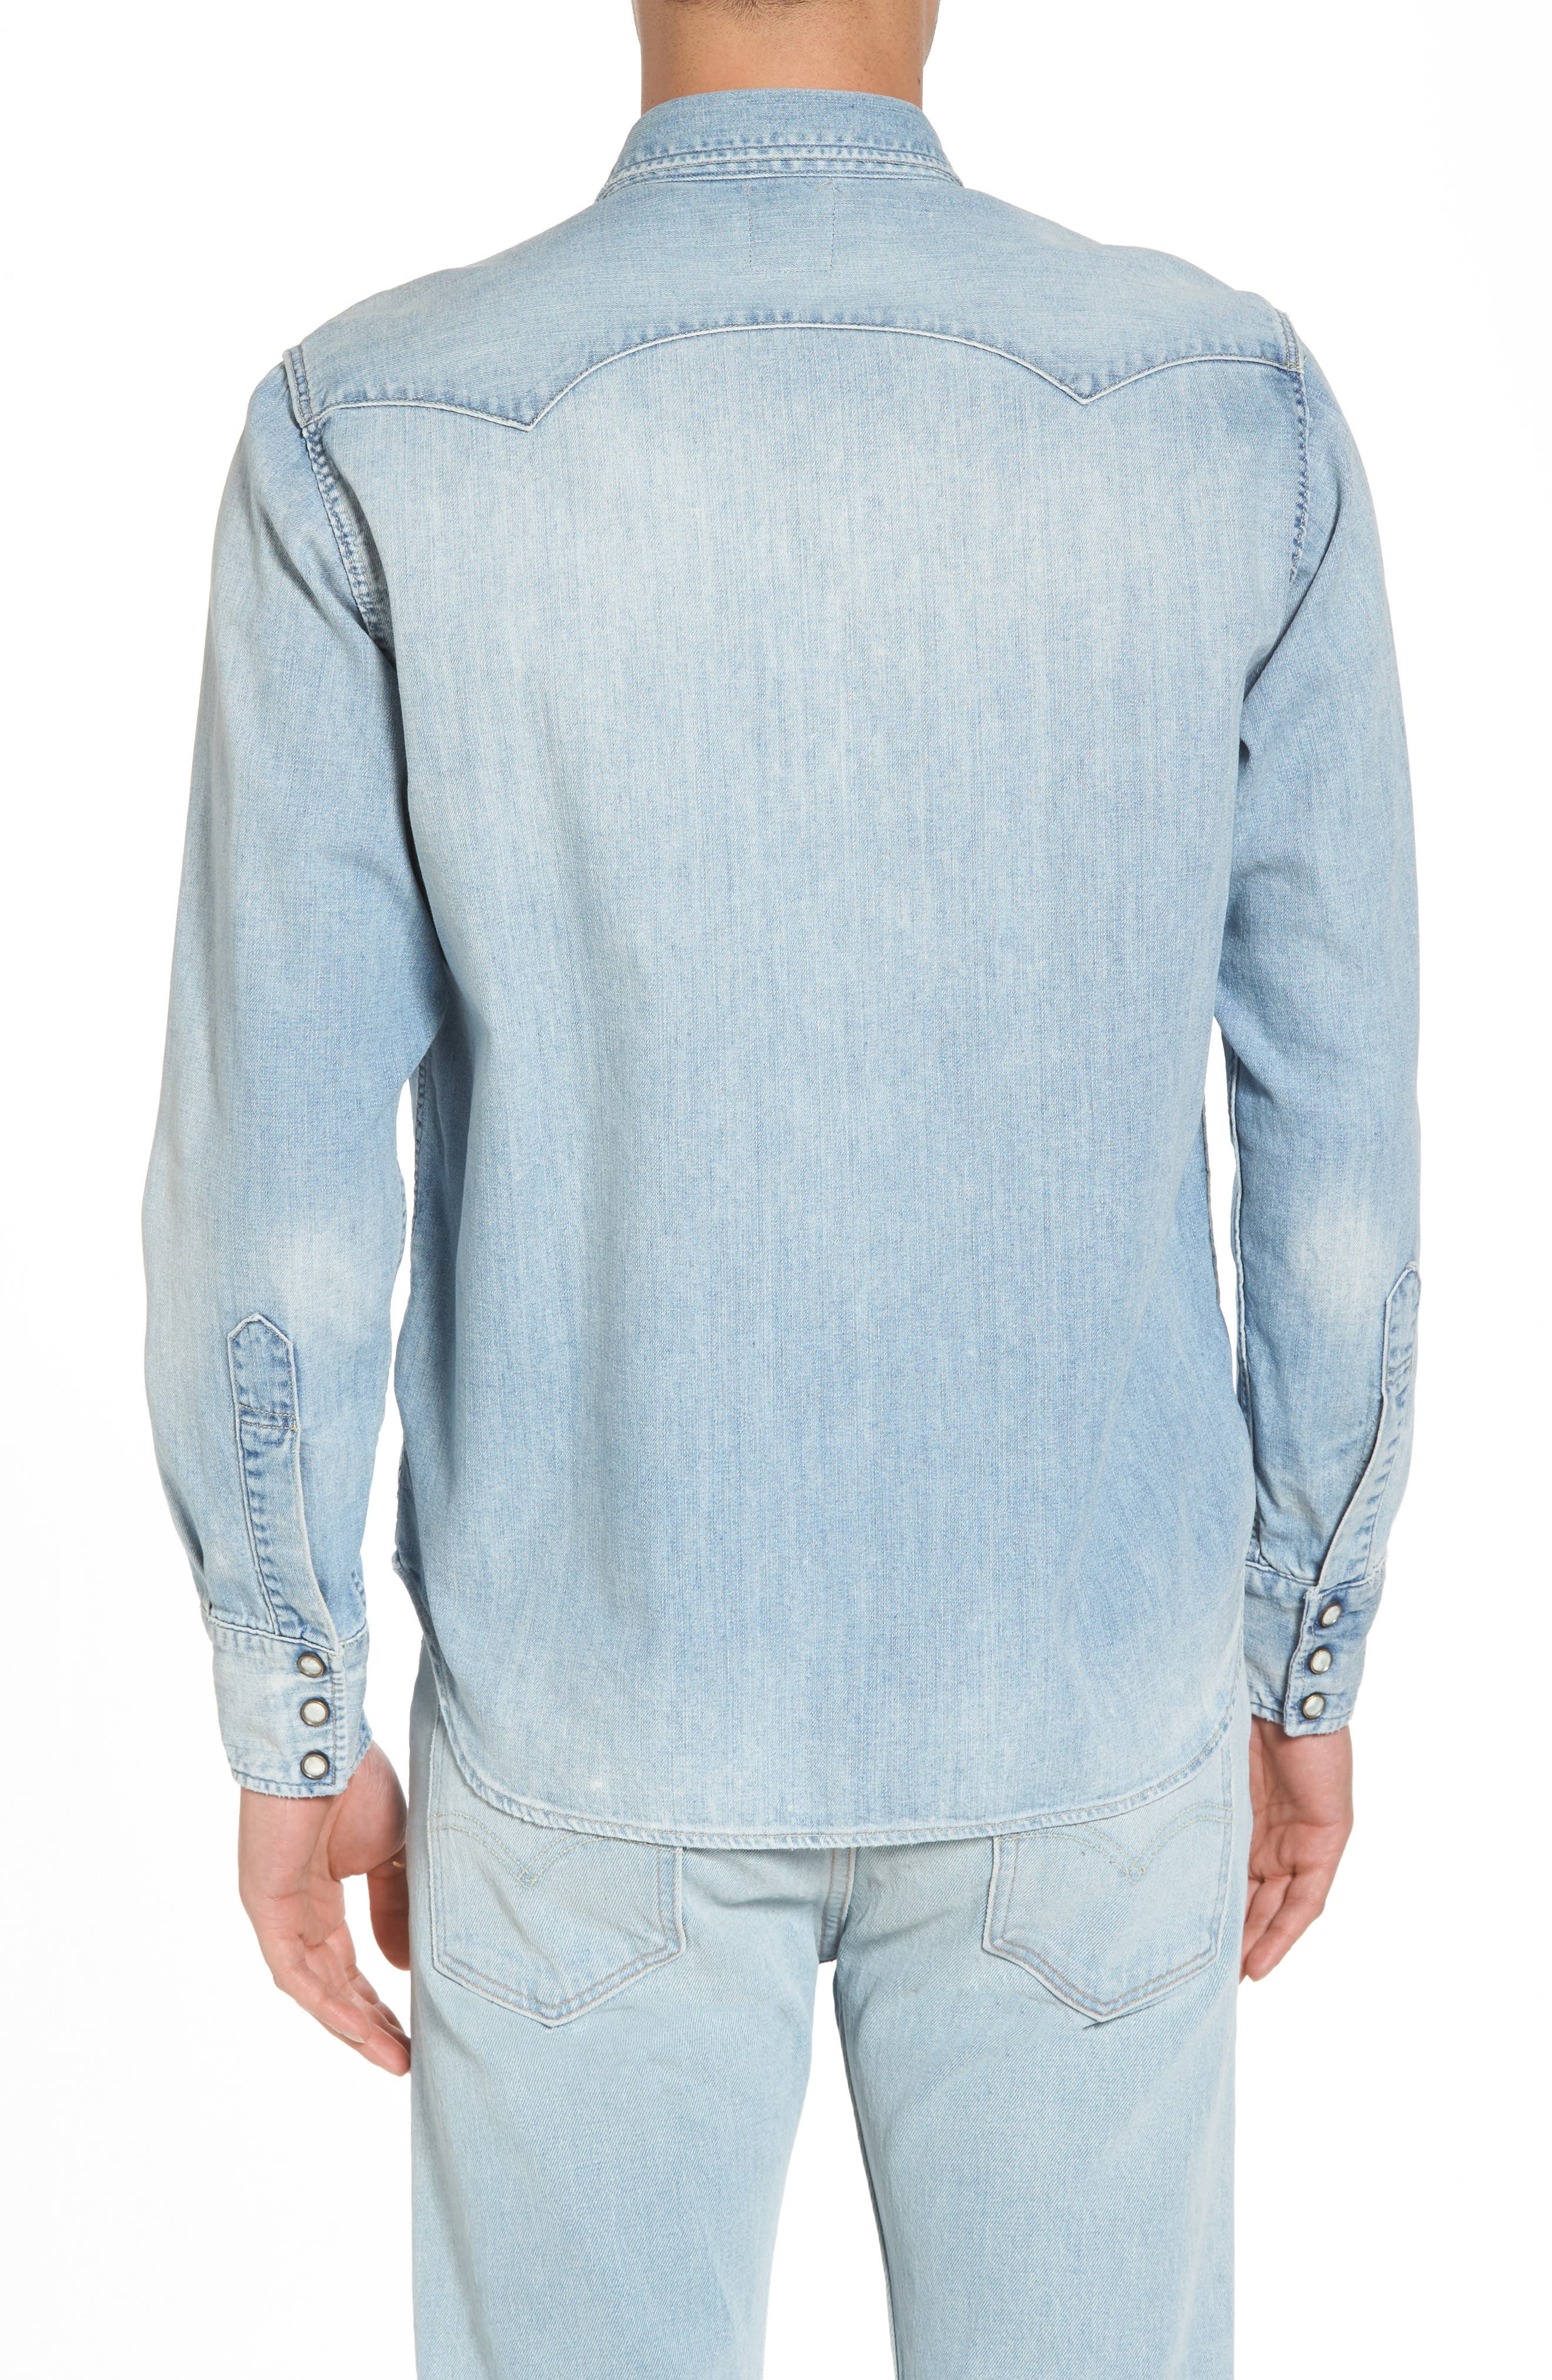 1955 Sawtooth Trim Fit Denim Western Shirt,                             Alternate thumbnail 2, color,                             Blue